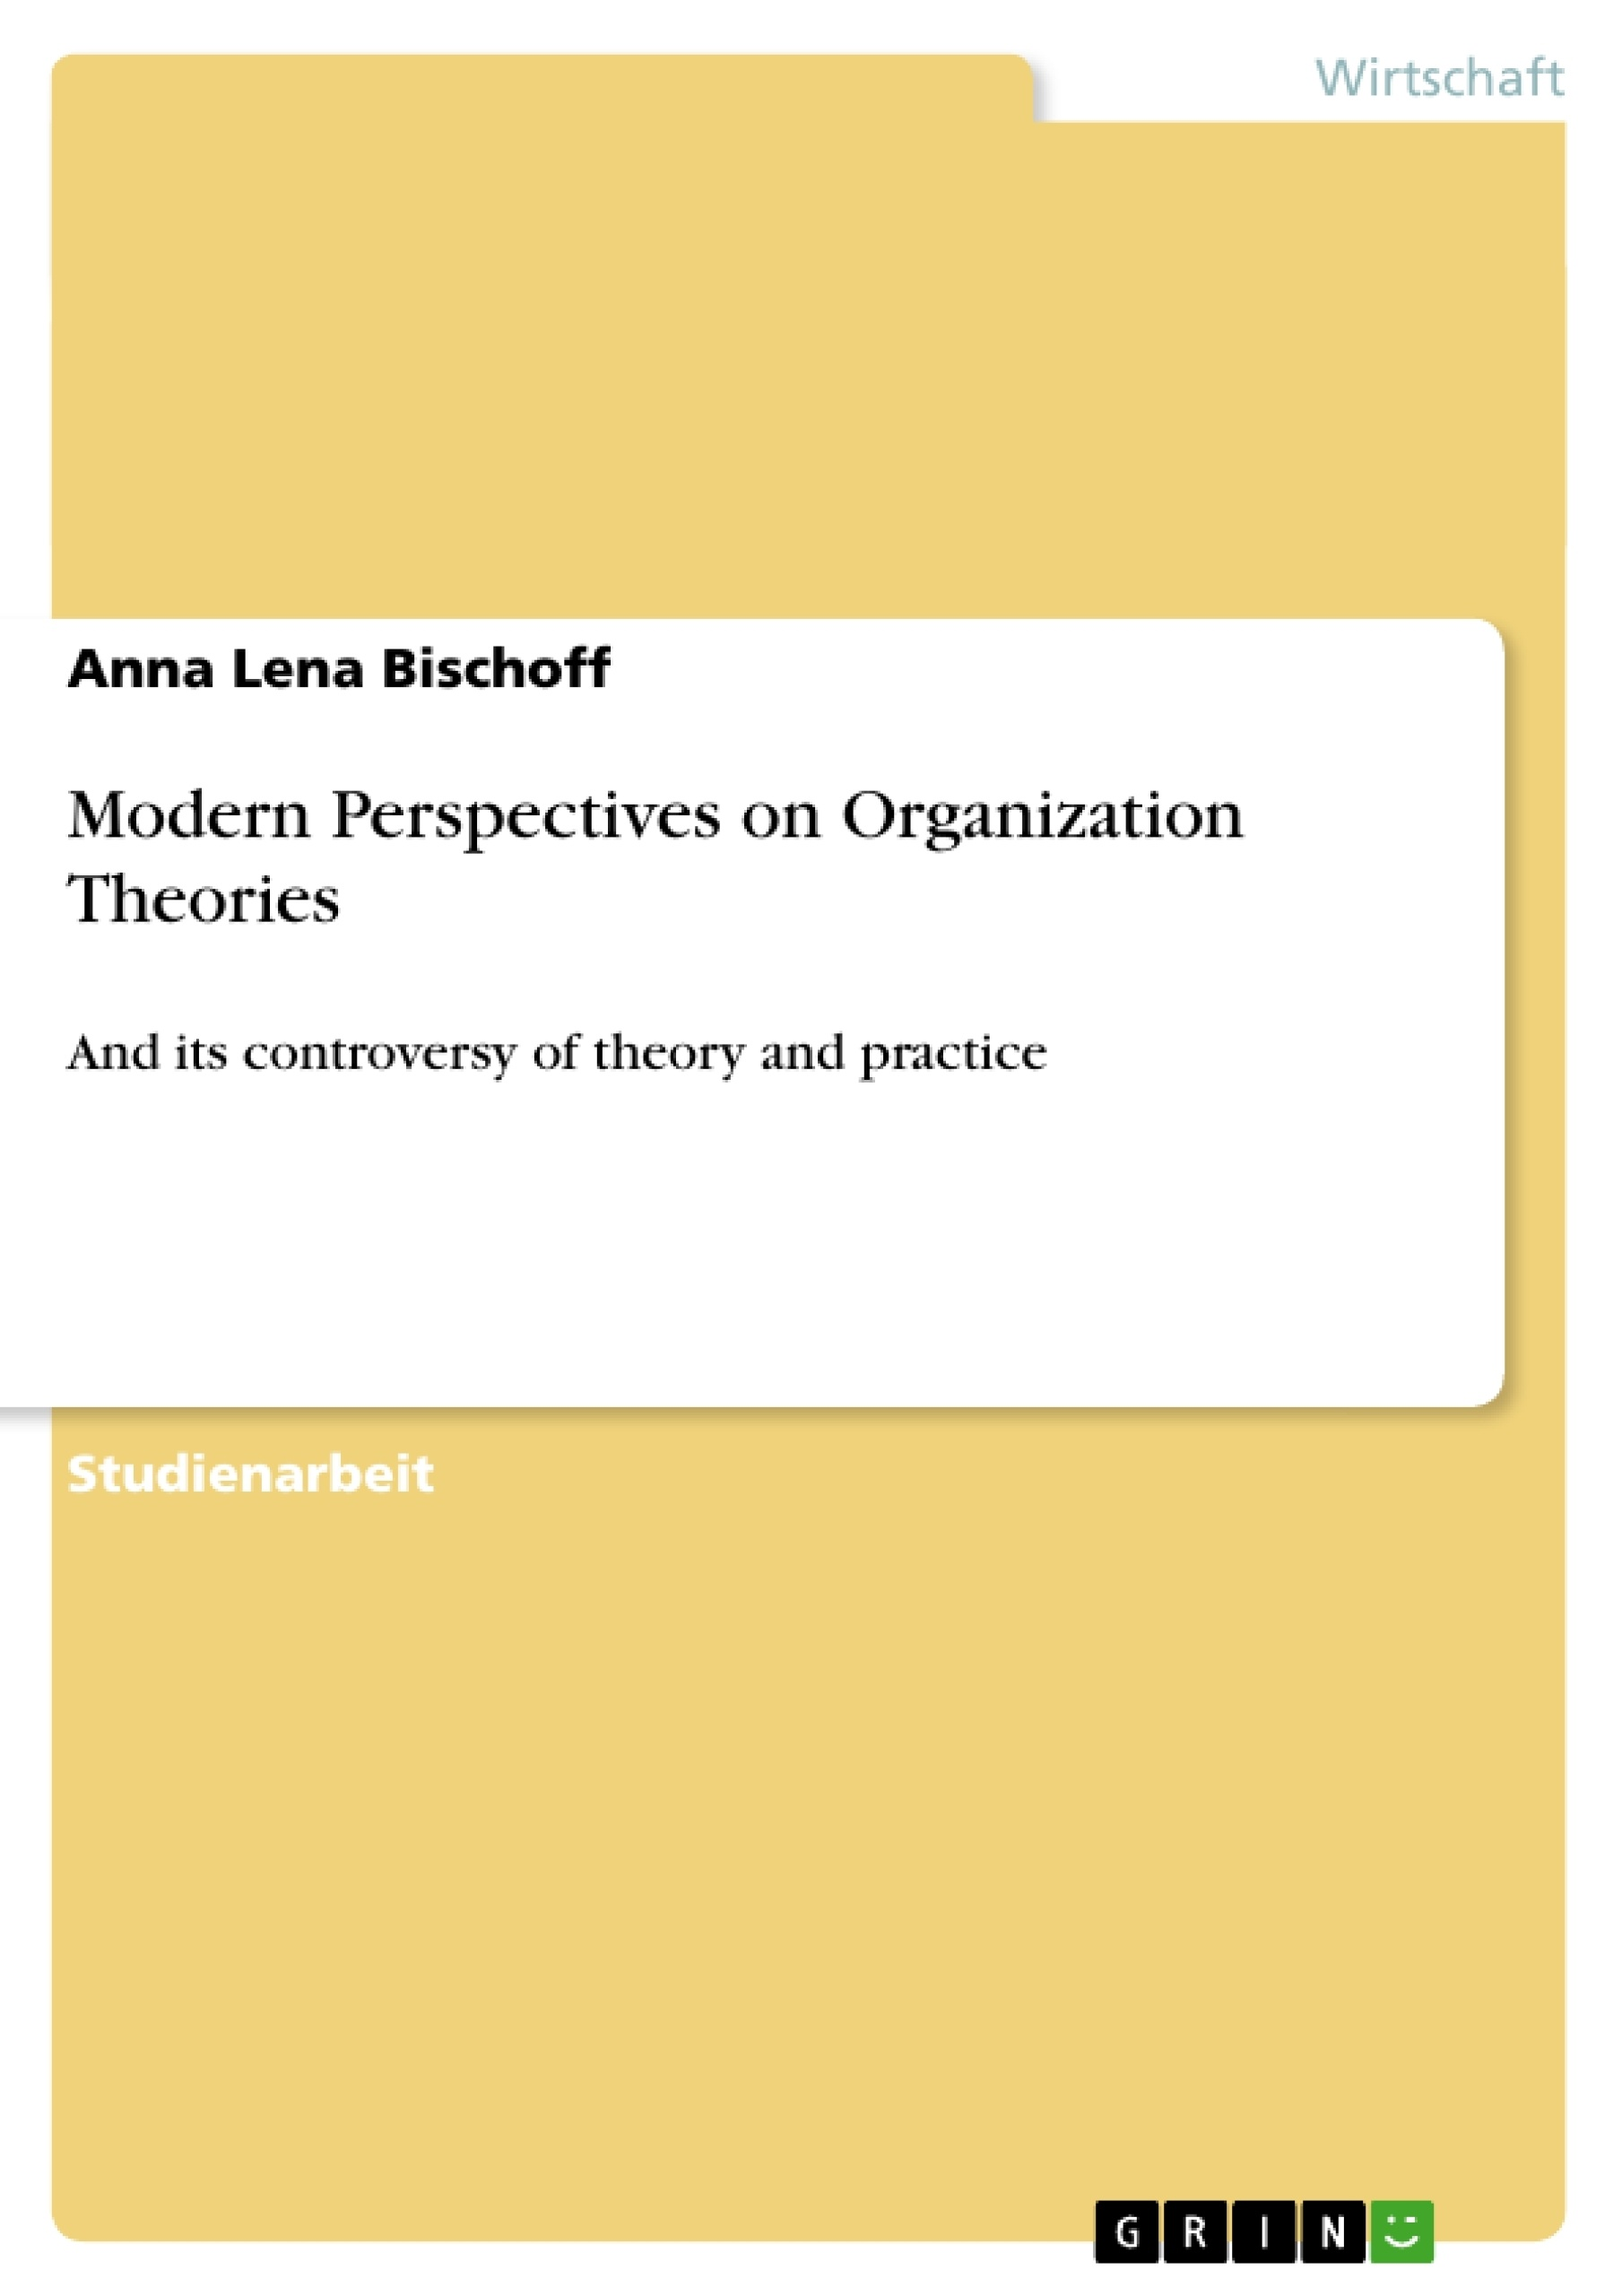 Titel: Modern Perspectives on Organization Theories